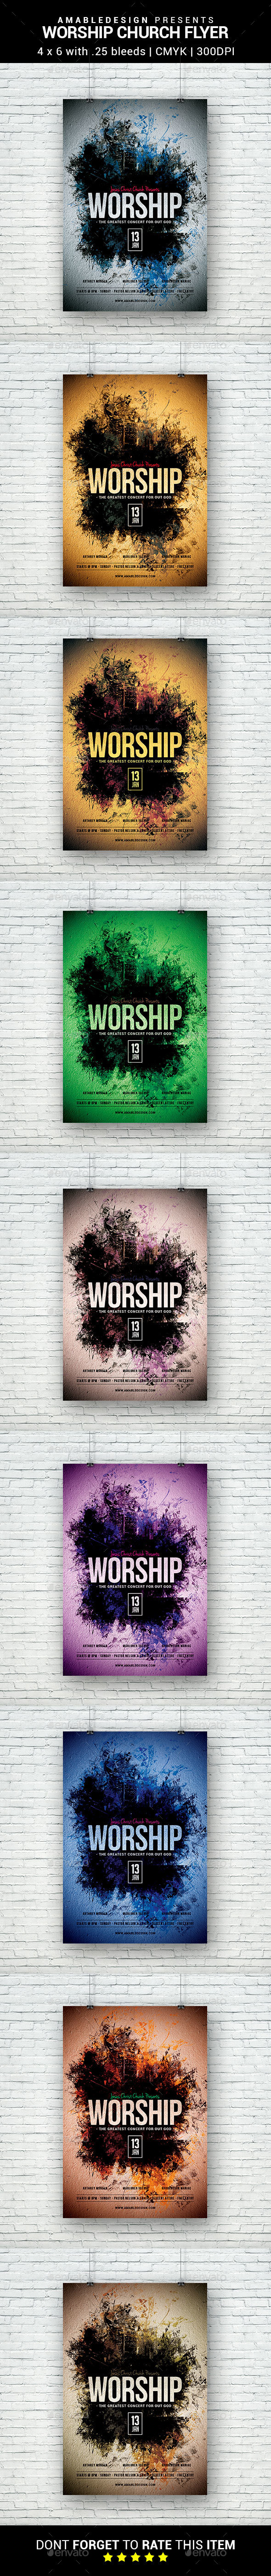 Worship Church Flyer - Church Flyers